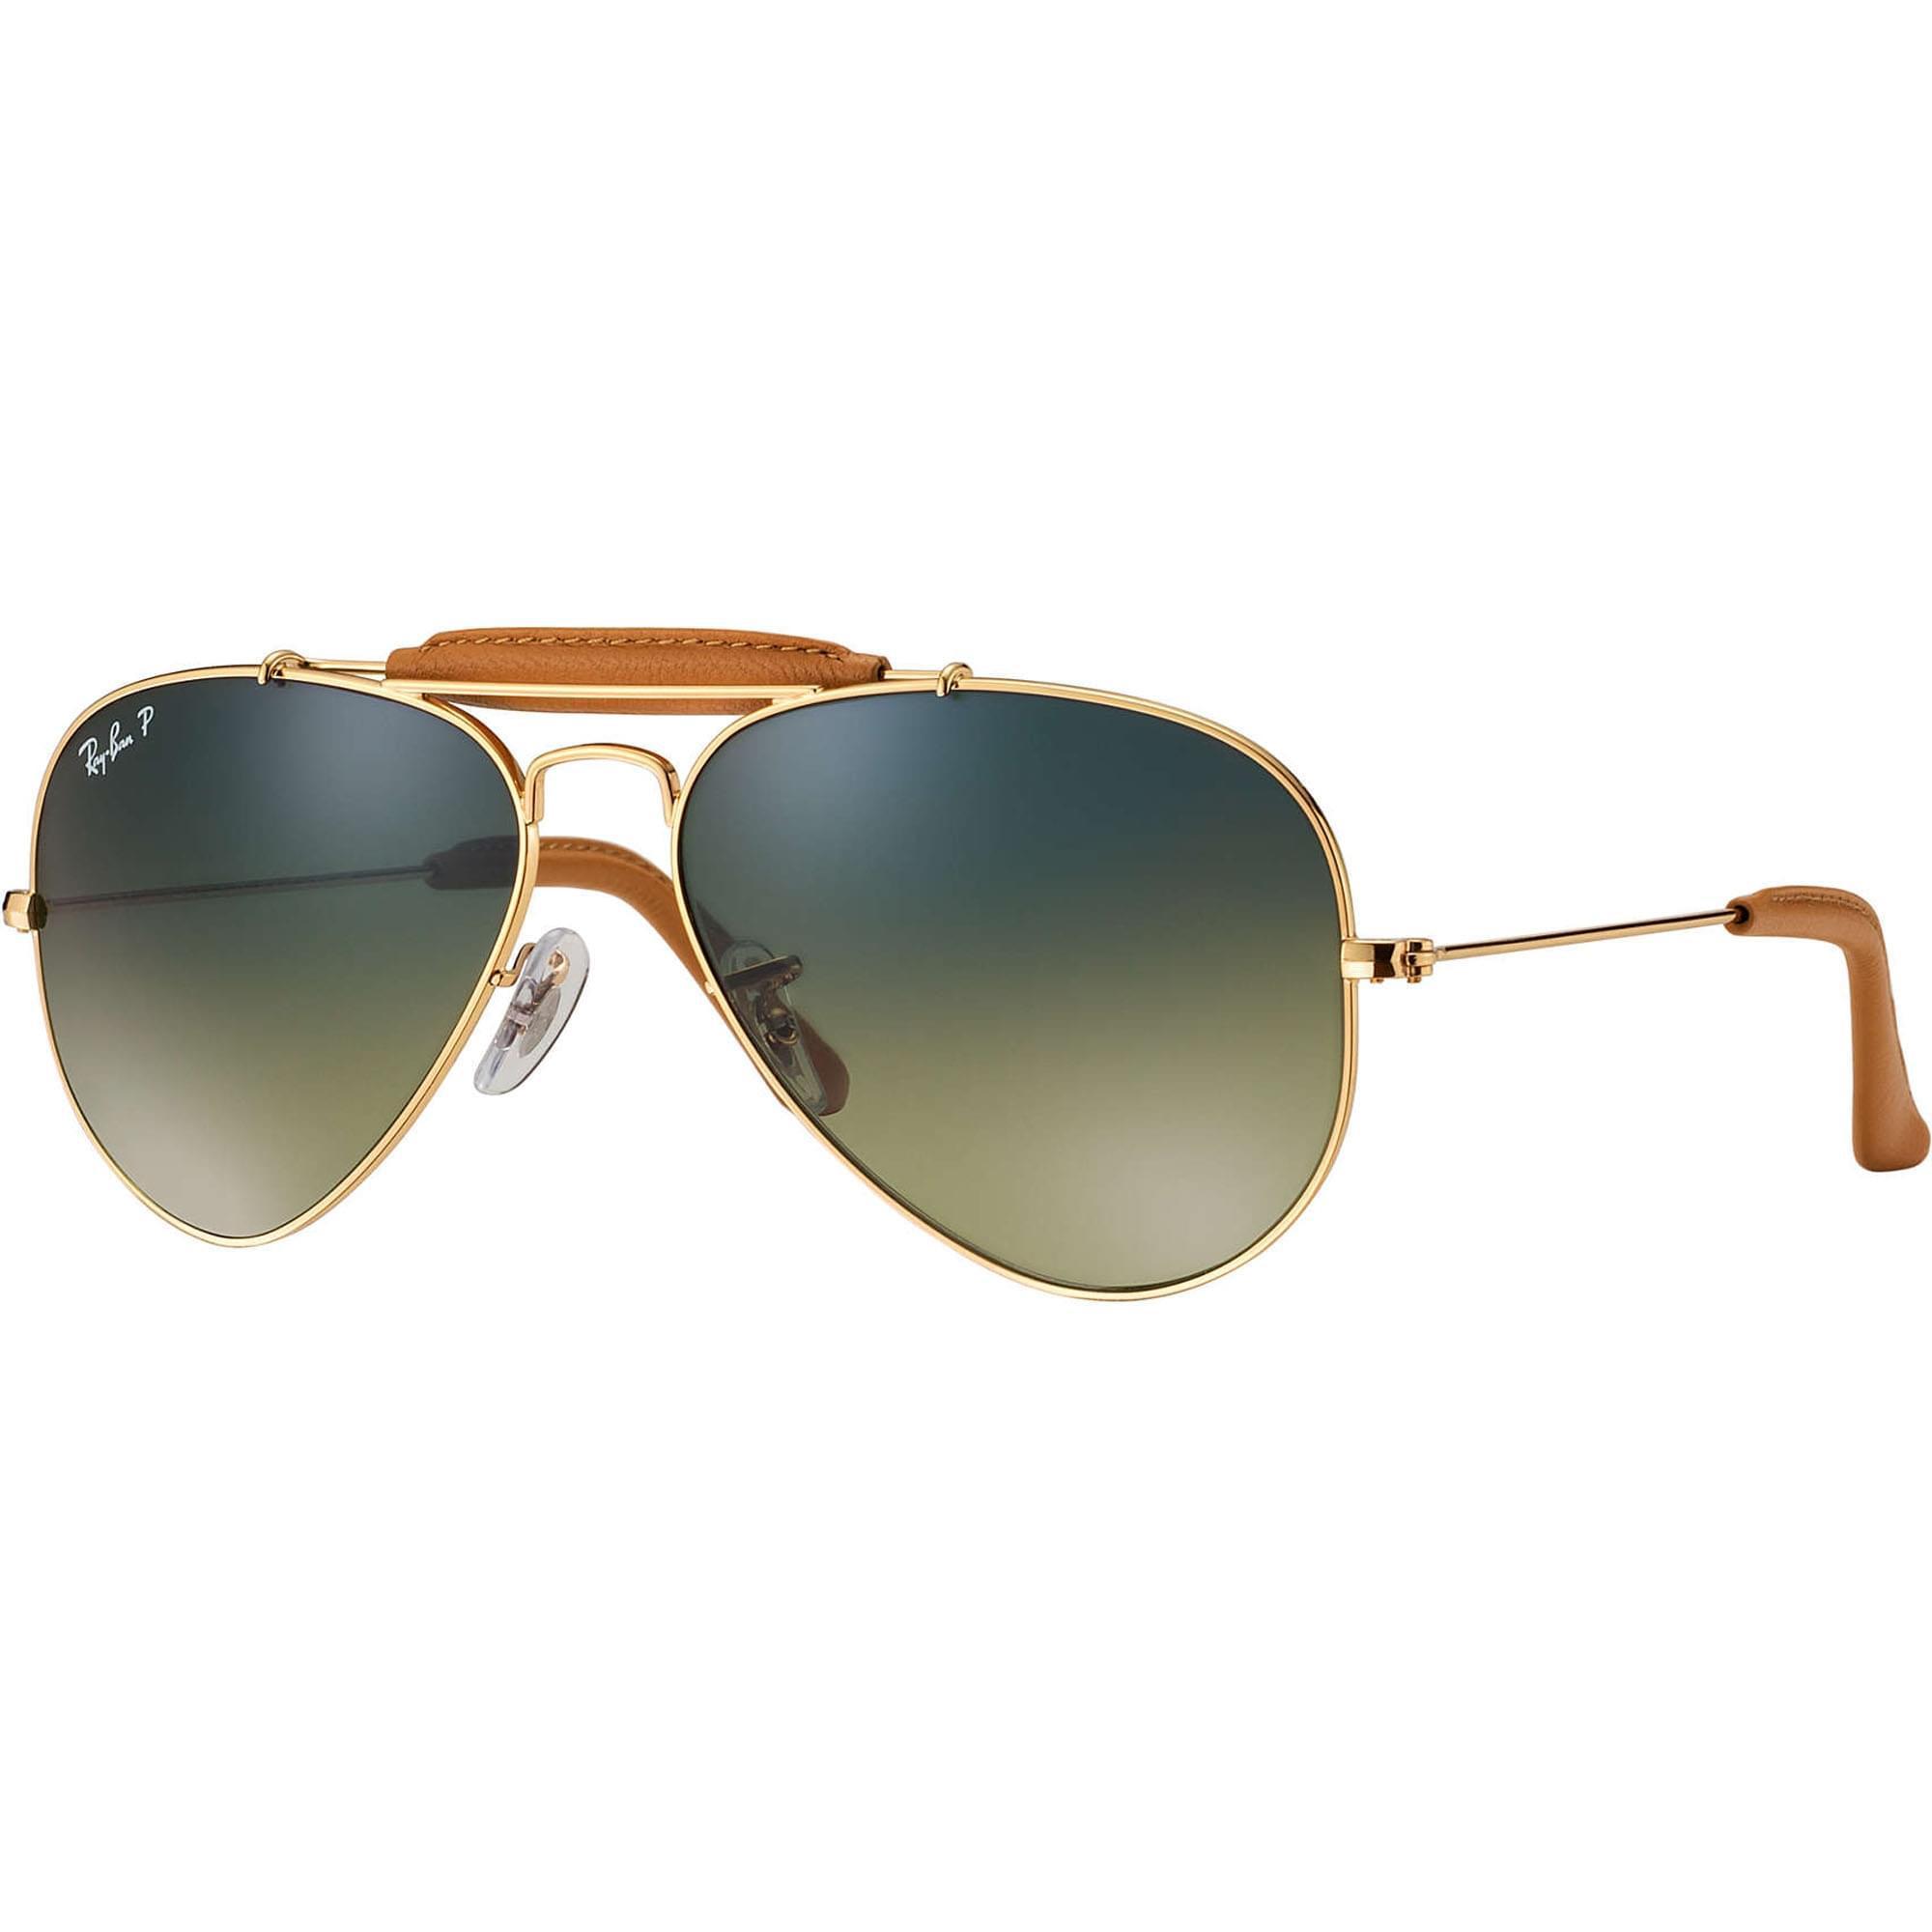 fc3f79991a Ray-Ban. Men s Outdoorsman Craft Aviator Sunglasses - Green Classic G-15  Lenses